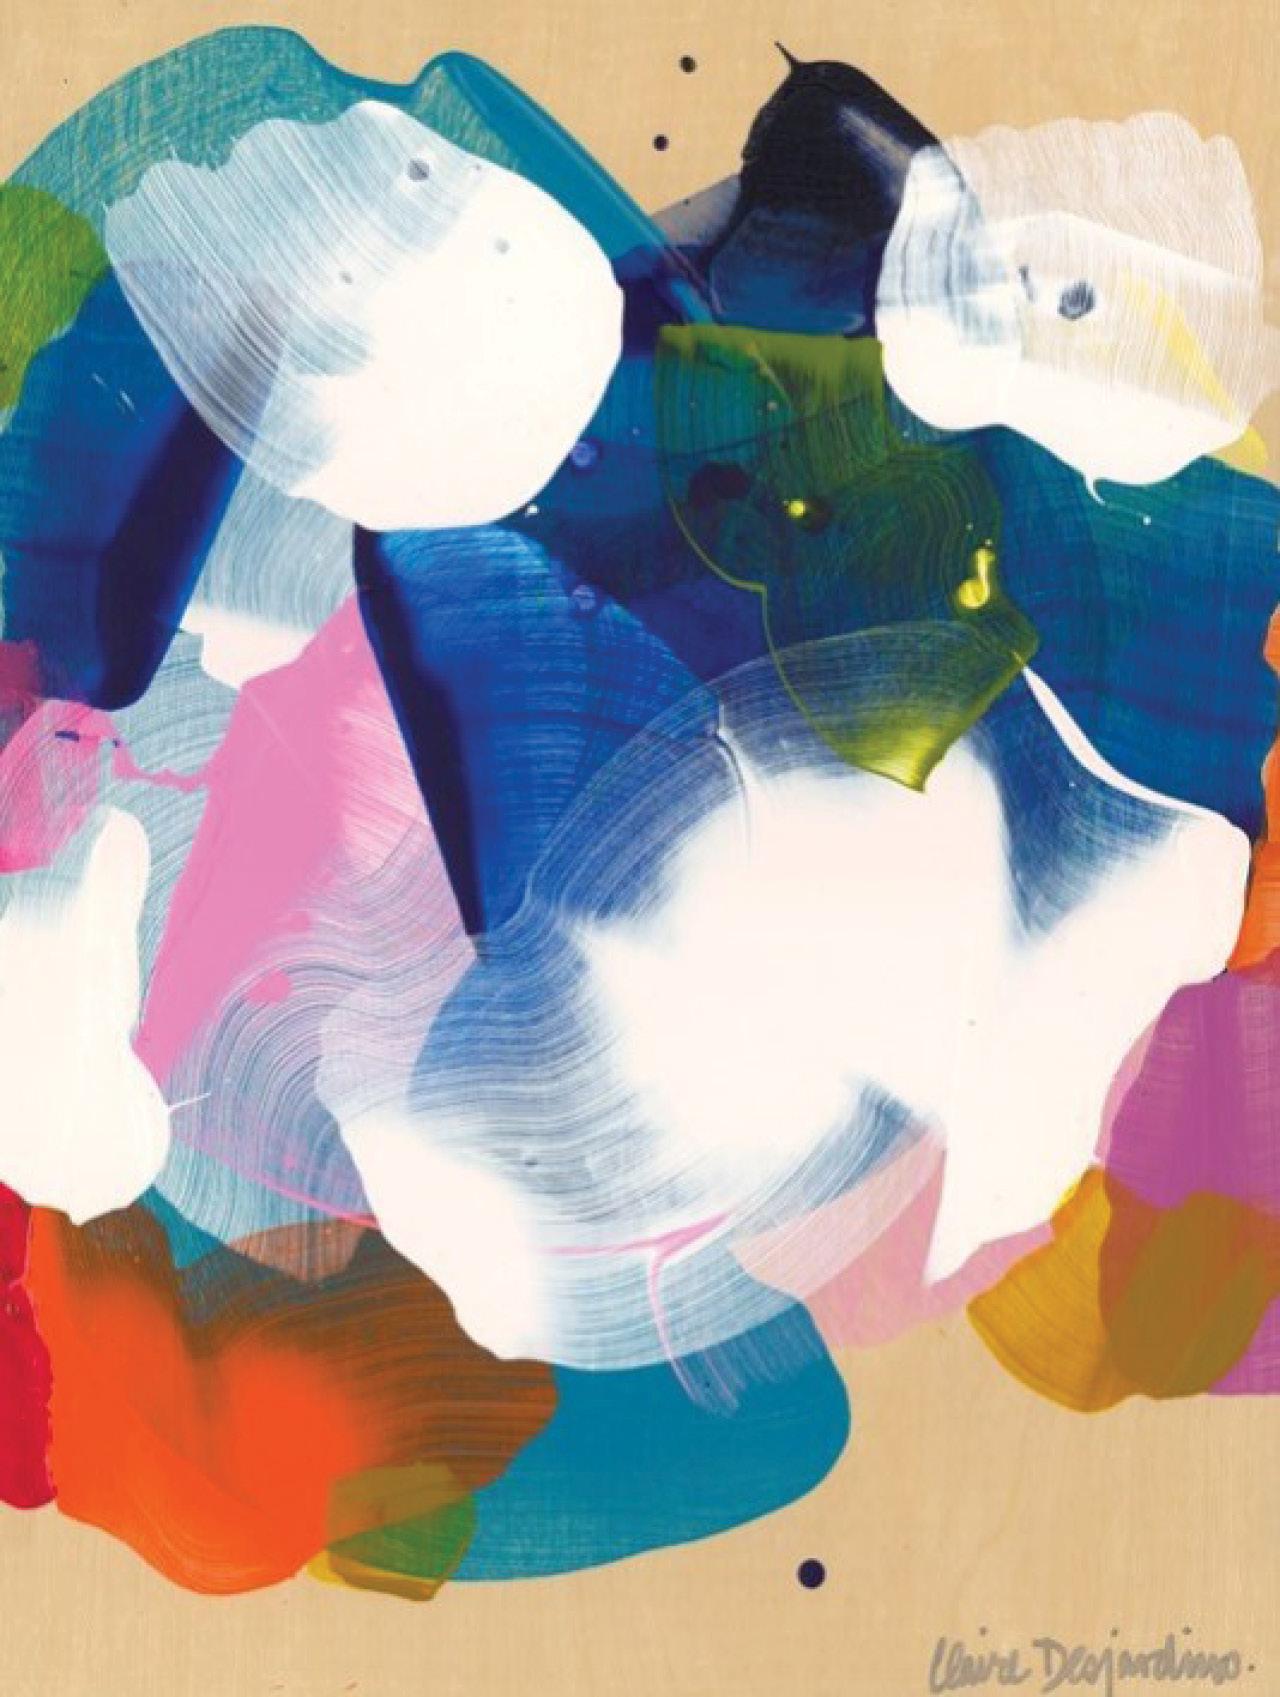 Claire Desjardins, SoCal 06, acrylic on panel